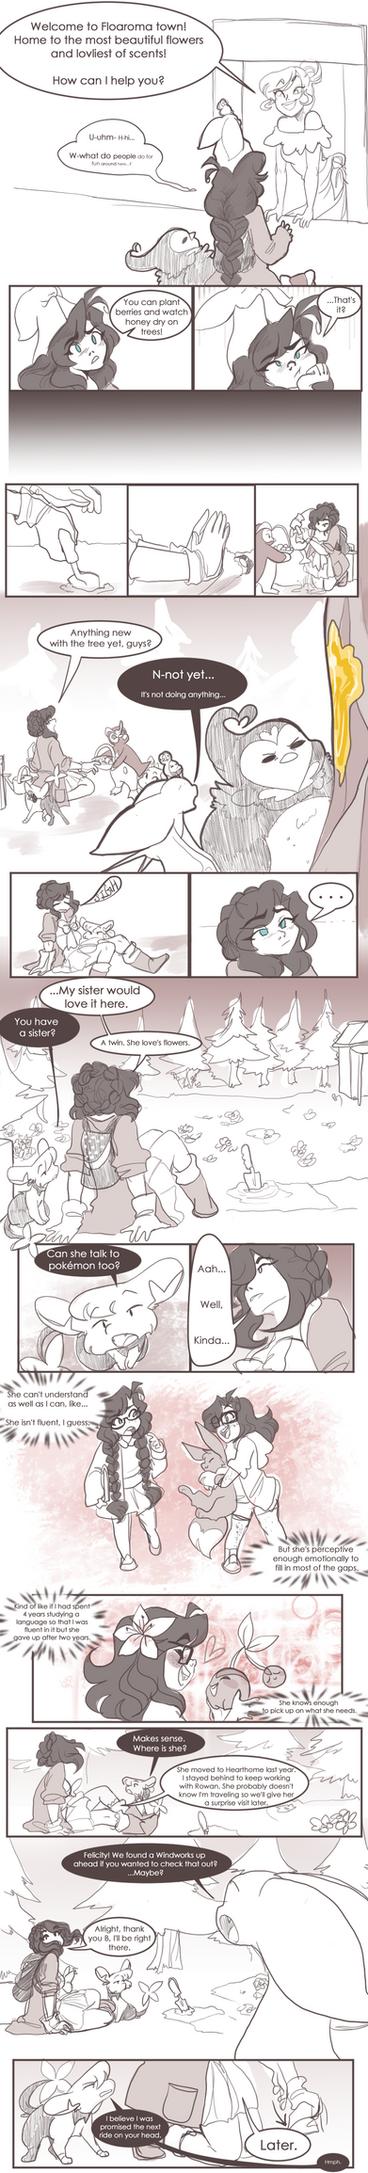 Lissylocke page 12 by Skitea